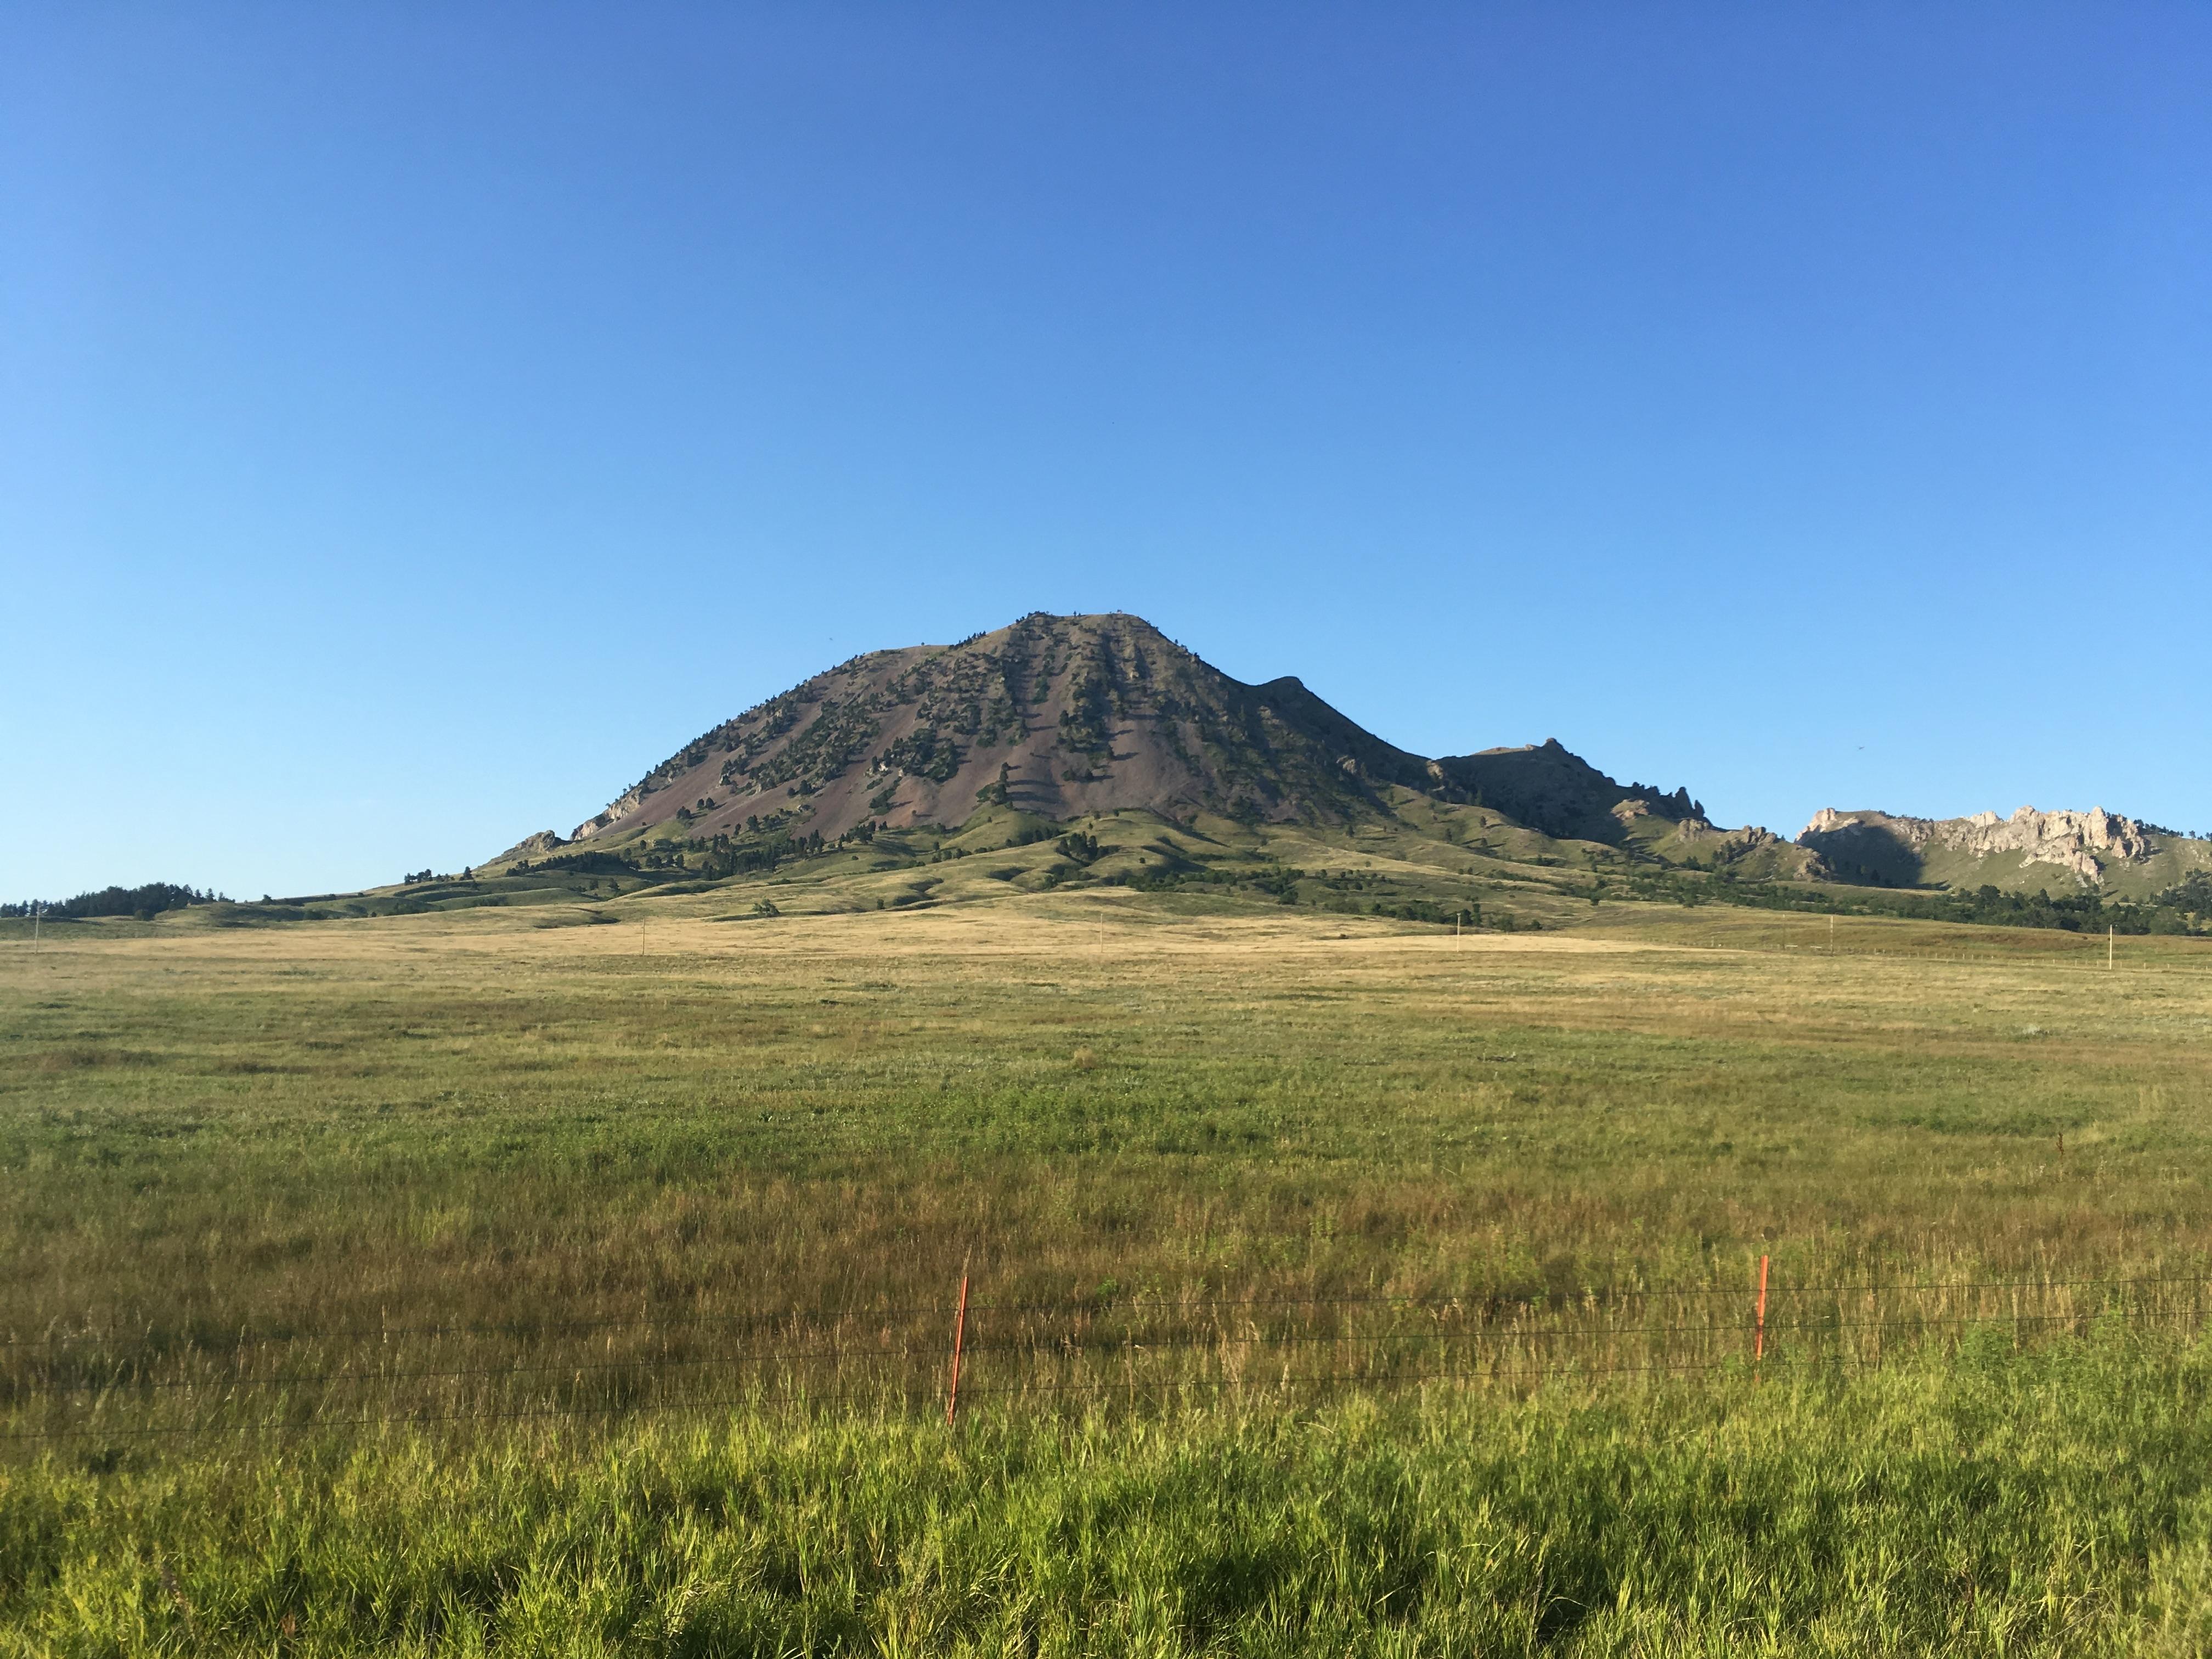 bear butte centennial trail south dakota clay bonnyman evans